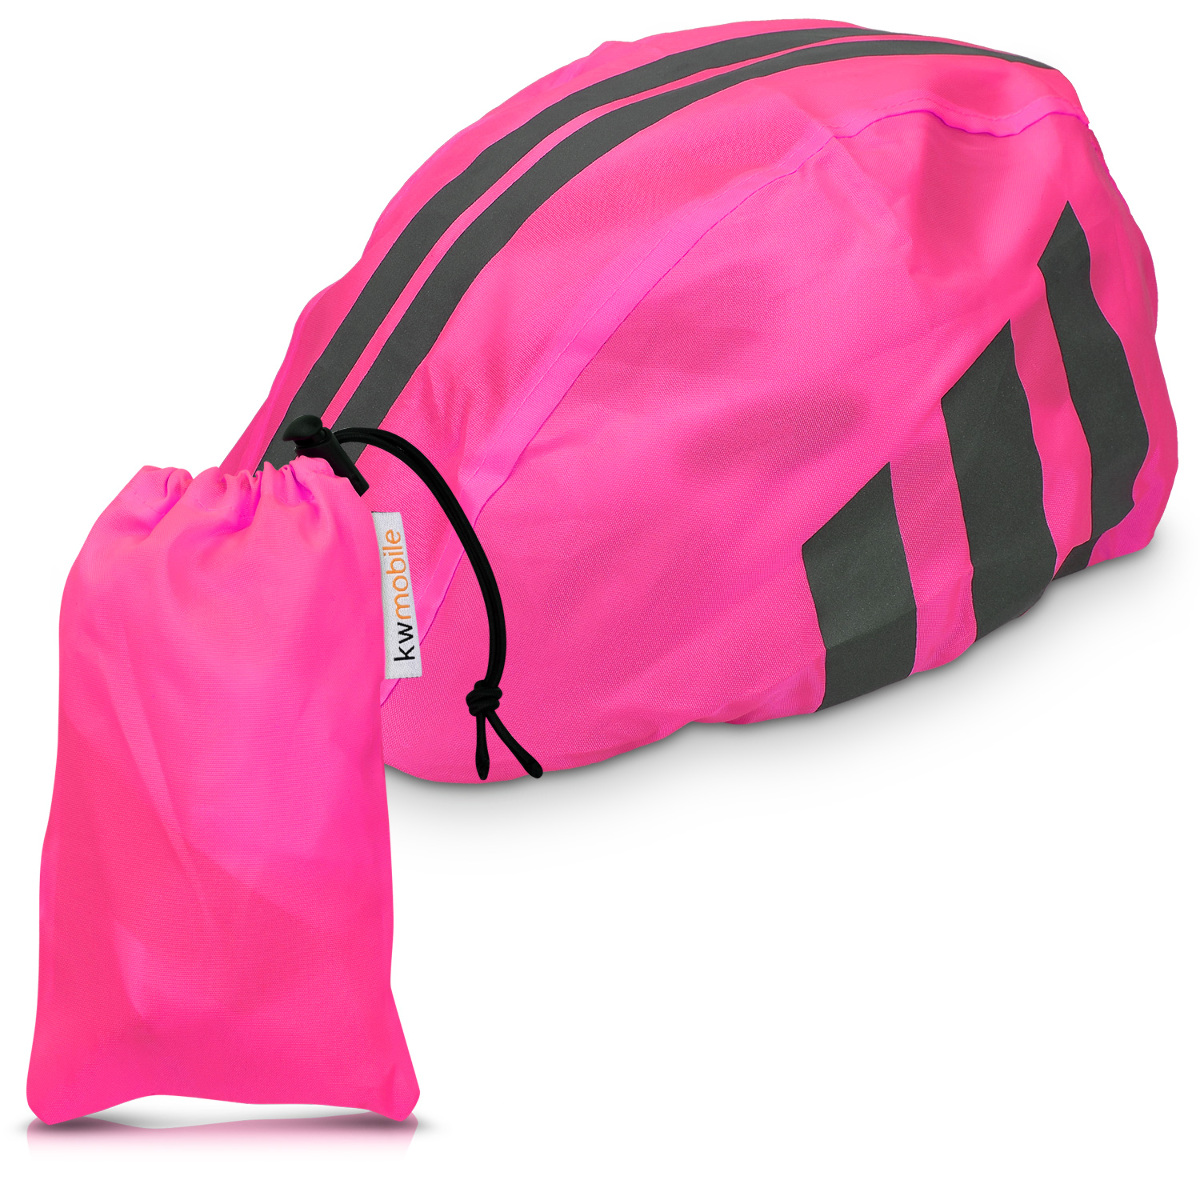 kwmobile-Funda-impermeable-de-casco-de-bicicleta-cubierta-protectora-para-casco